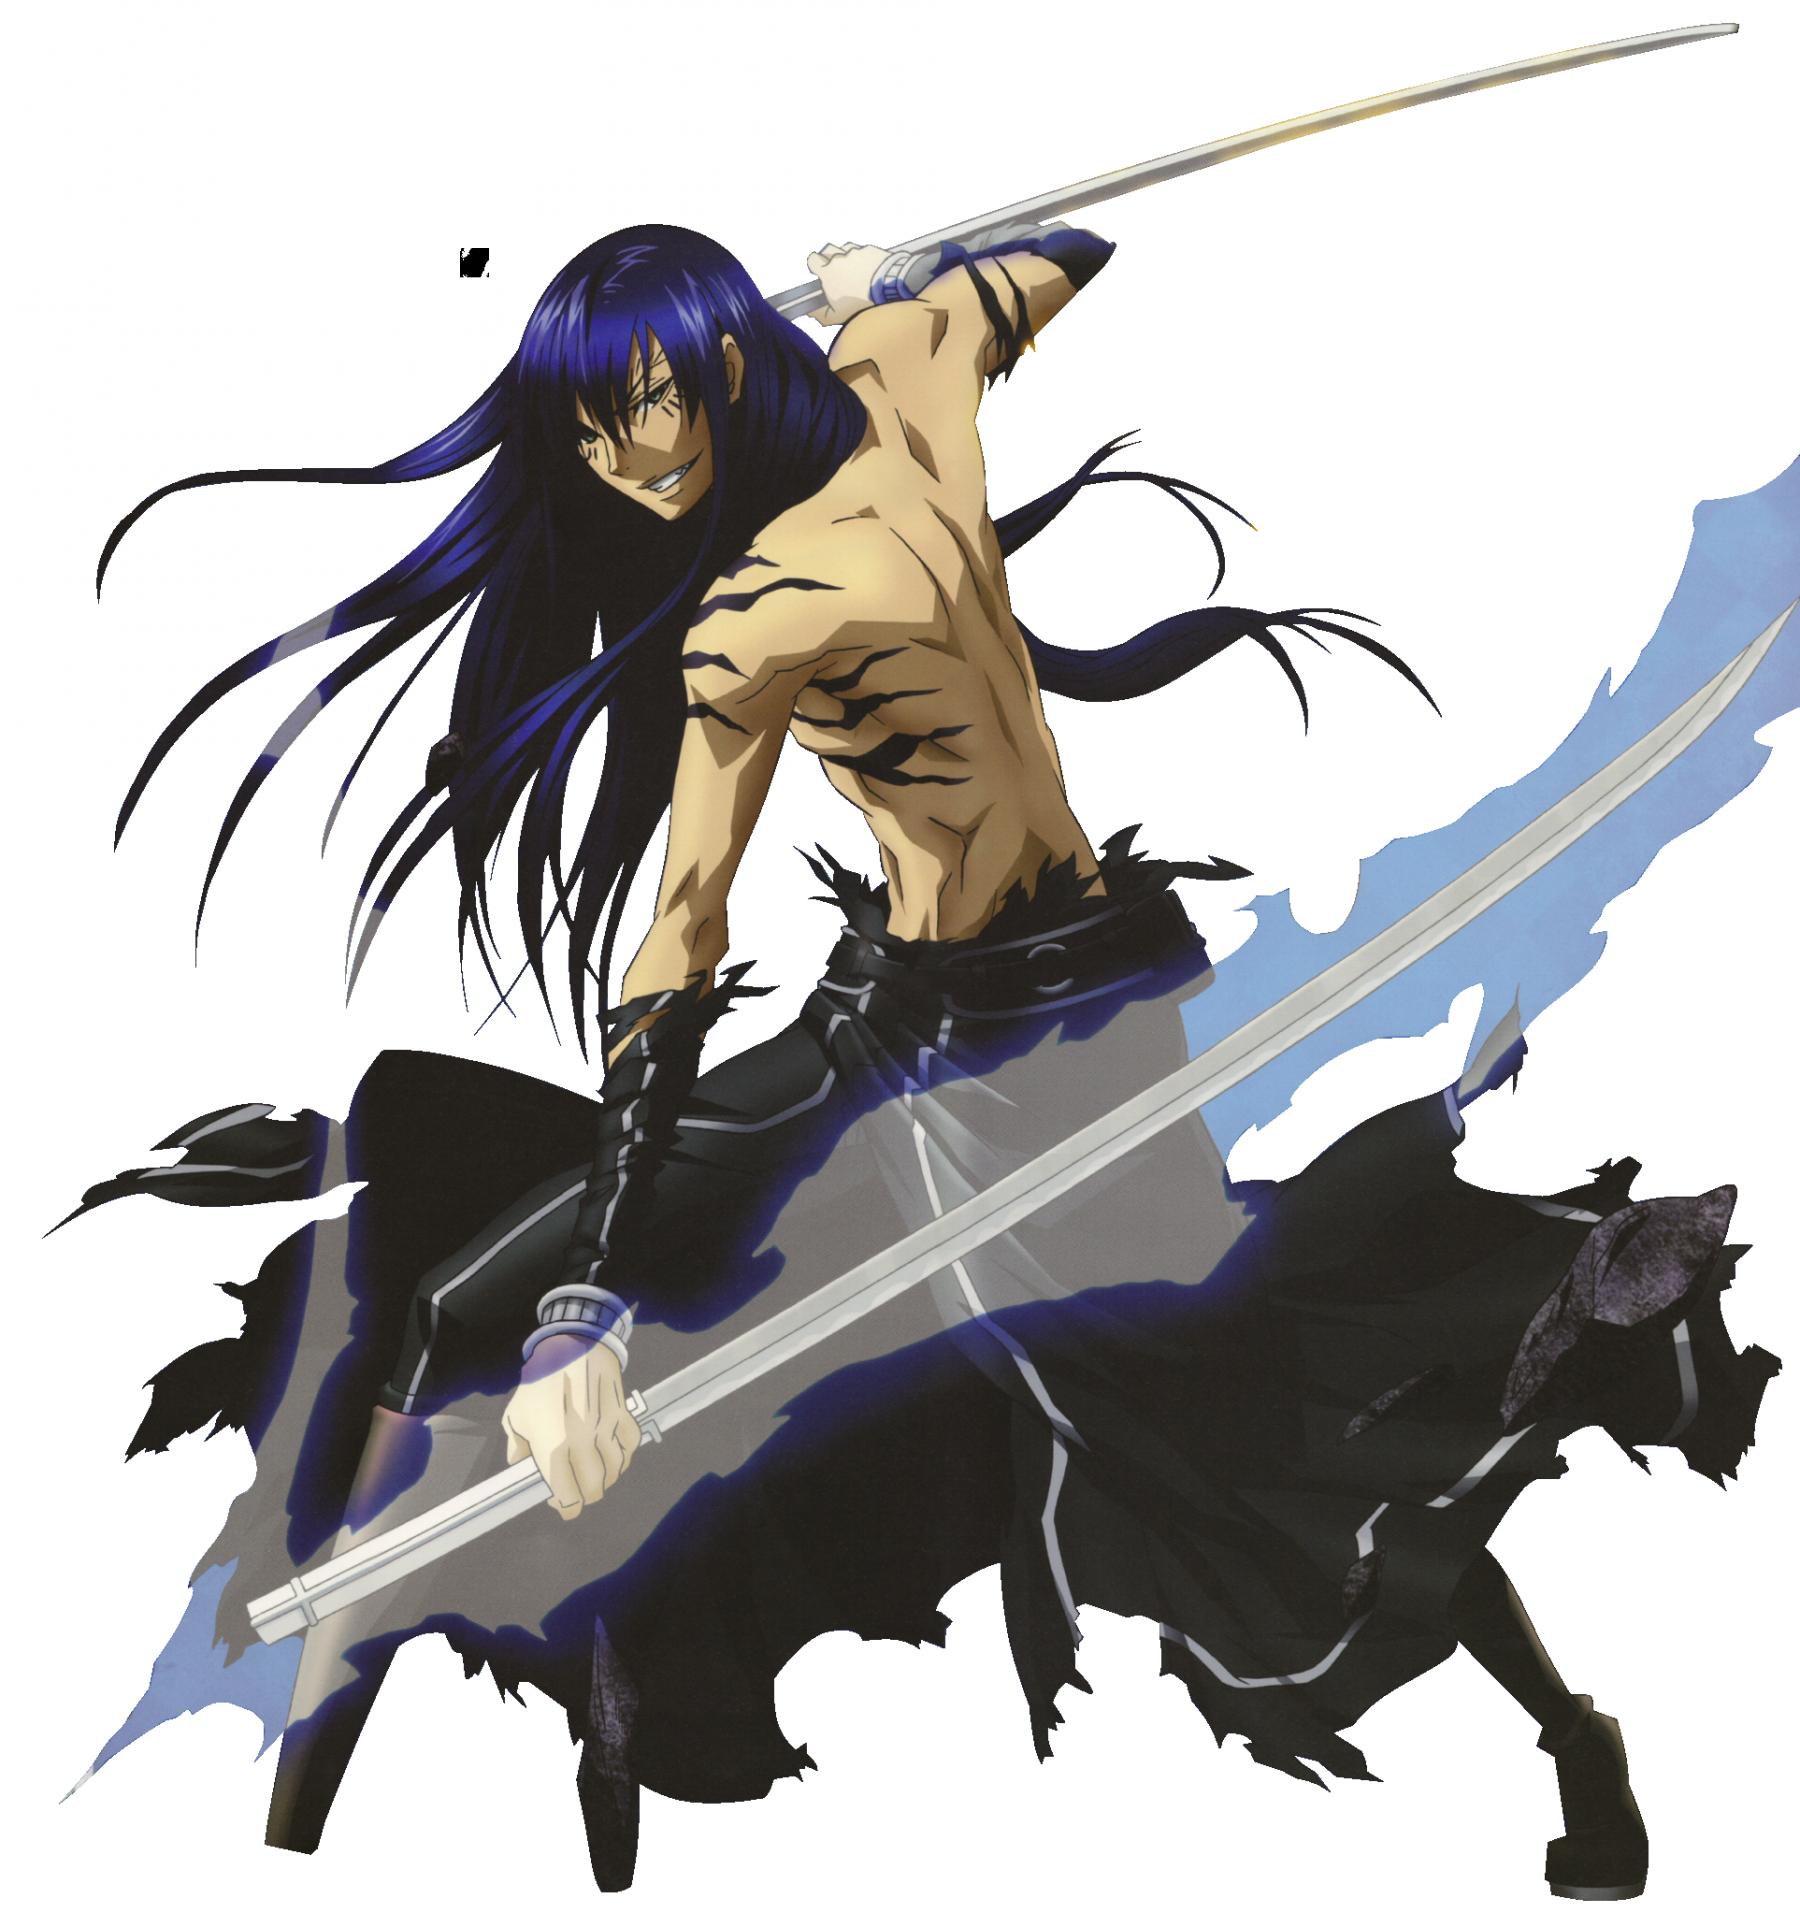 D.Gray-Man - Yu Kanda (...One of my favorite Kanda ...